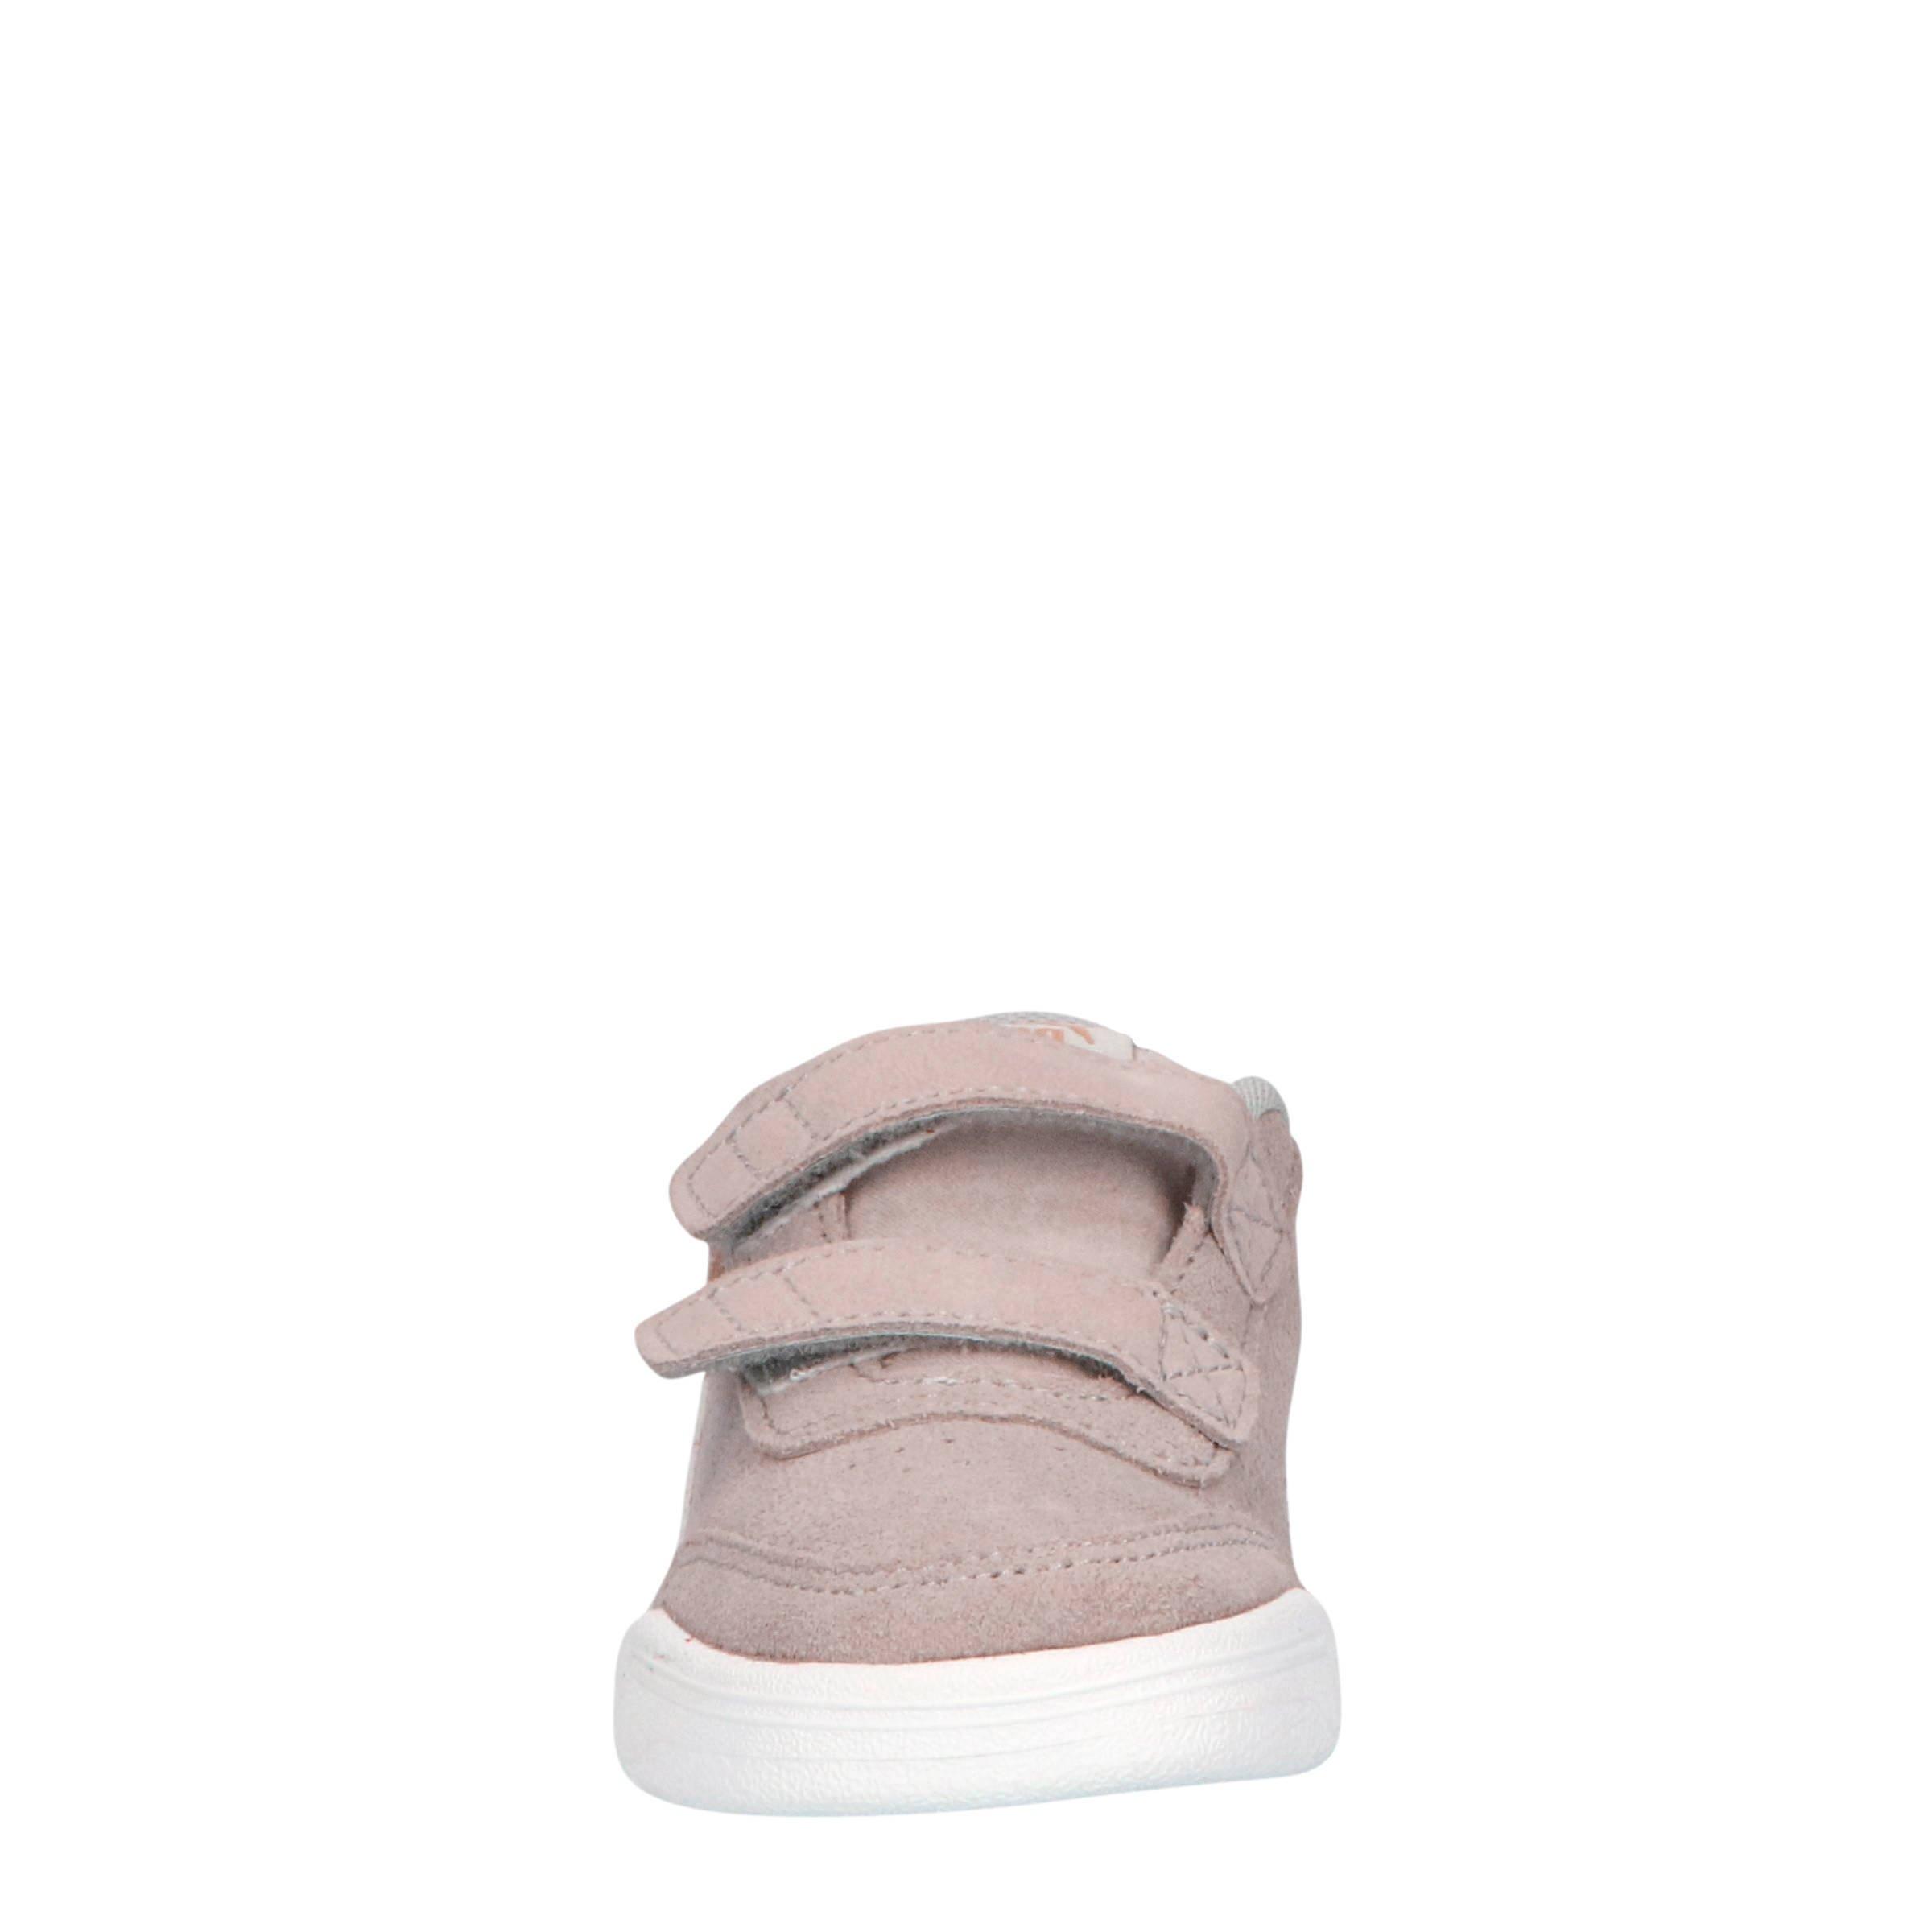 Puma Caracal SD V Inf sneakers licht grijswit | wehkamp